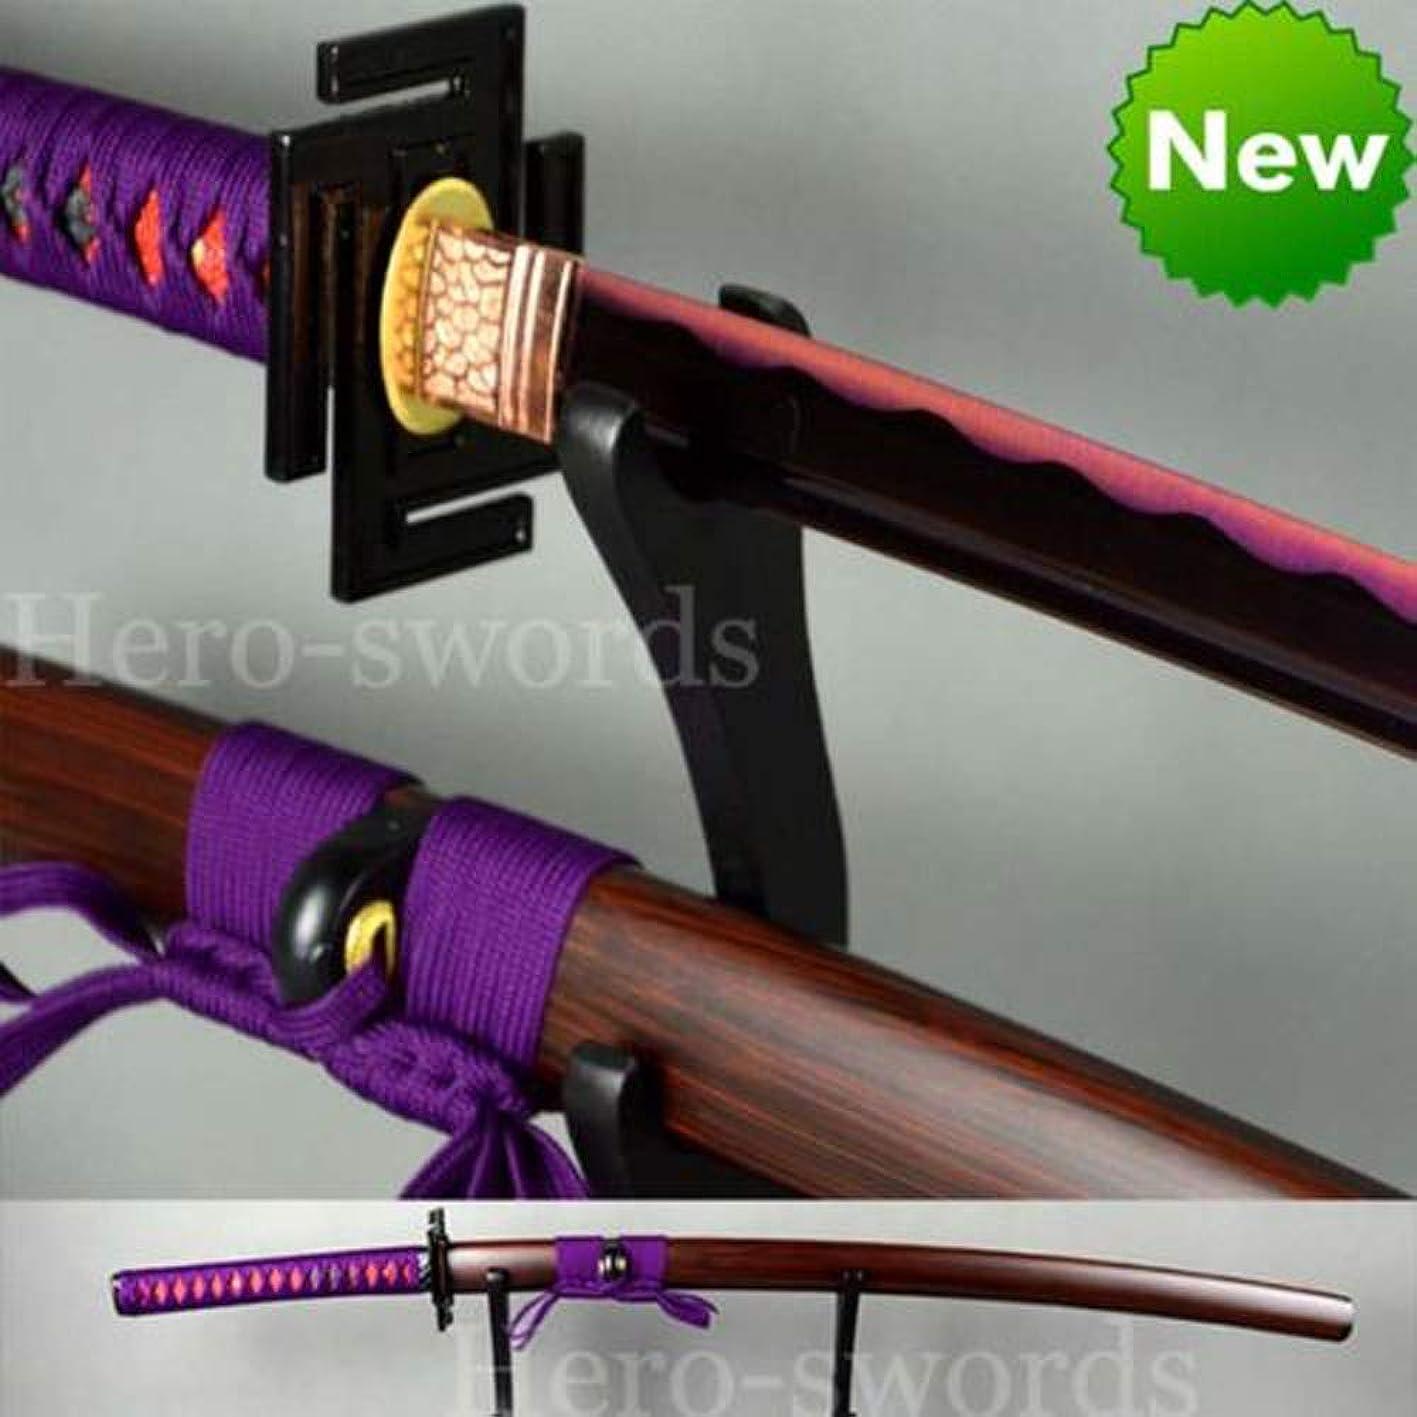 Handmade 1060 high Carbon Steel Purple Blade Katana,Ninja, Full Tang Sharp Japanese Samurai Sword Can Bamboo Trees tdtxqfgdeud488